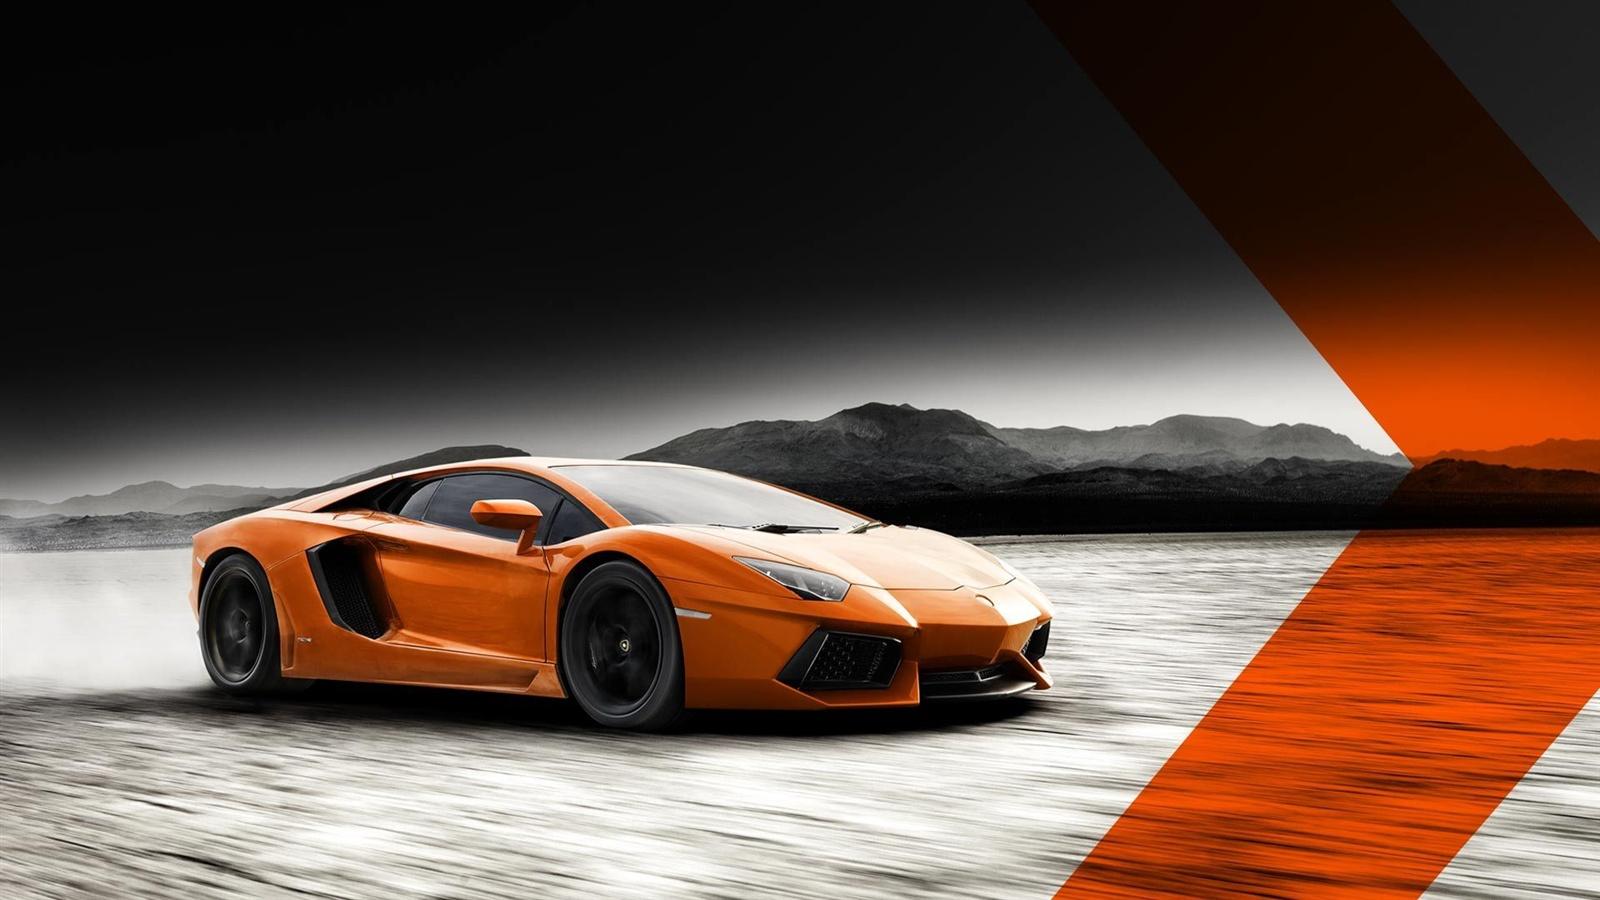 Wallpaper Lamborghini Aventador Lp700 4 Orange Color